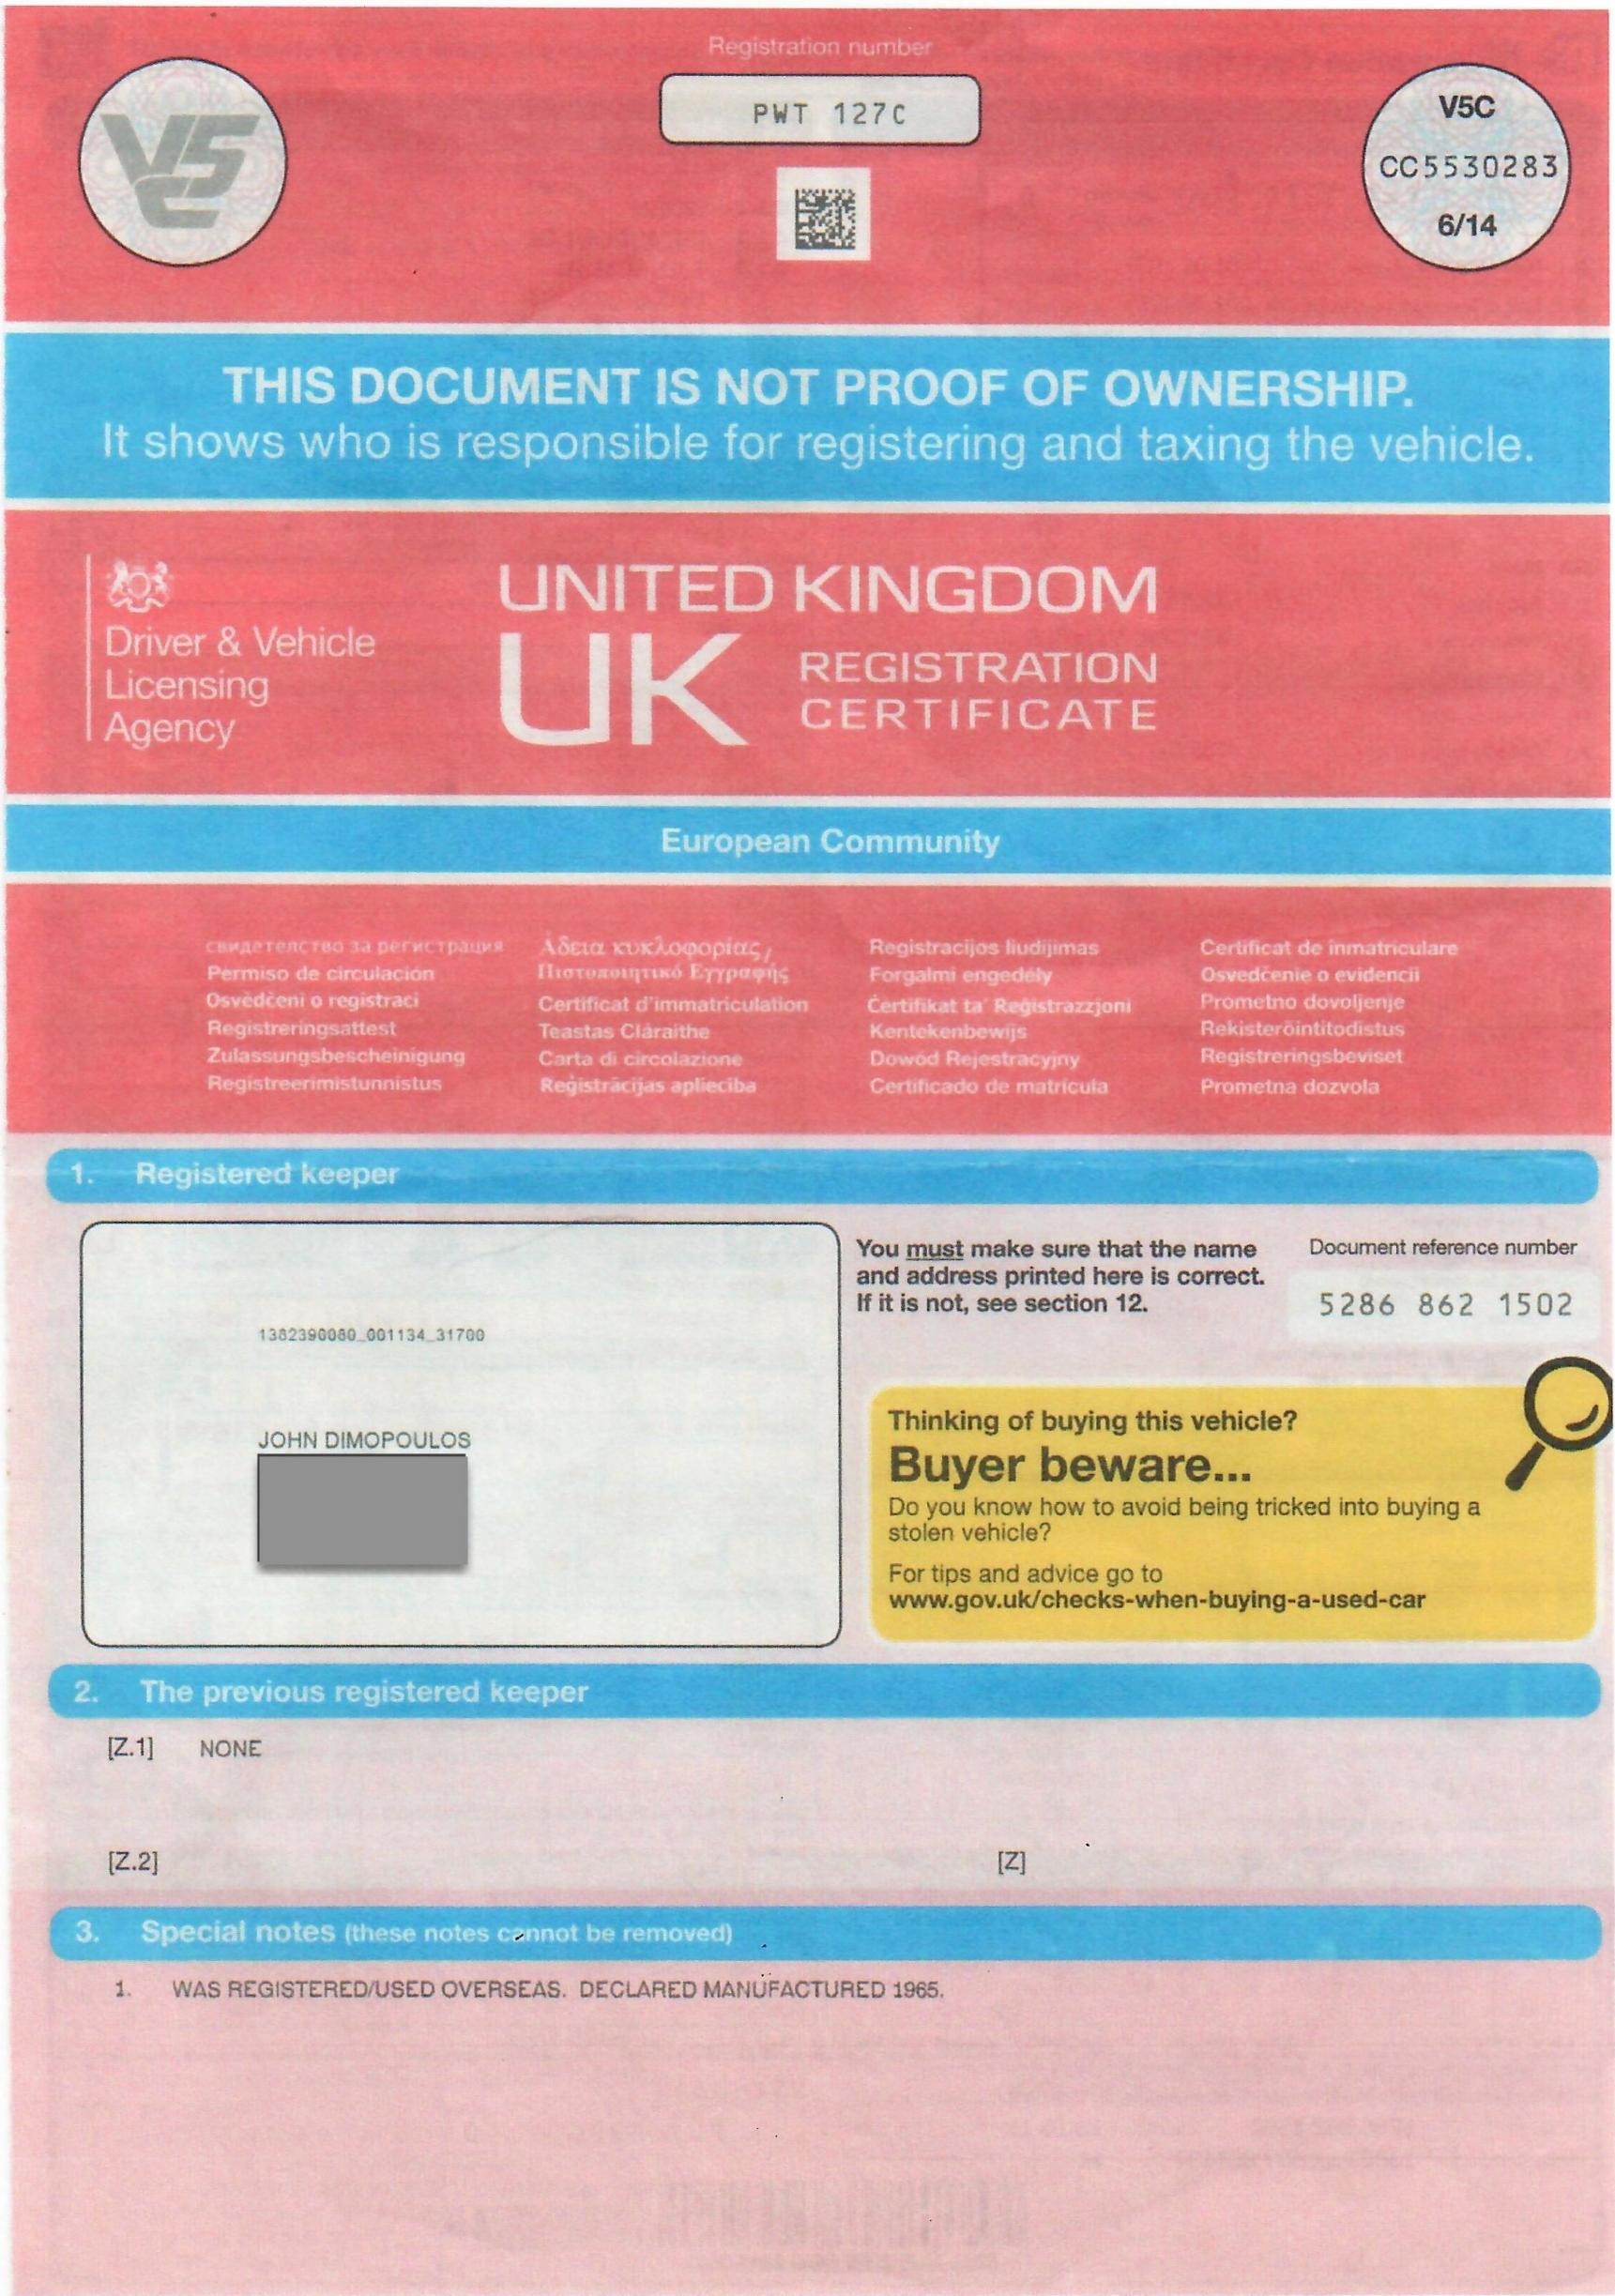 2015 Dimopoulos UK Registration Certificate pg1.jpeg